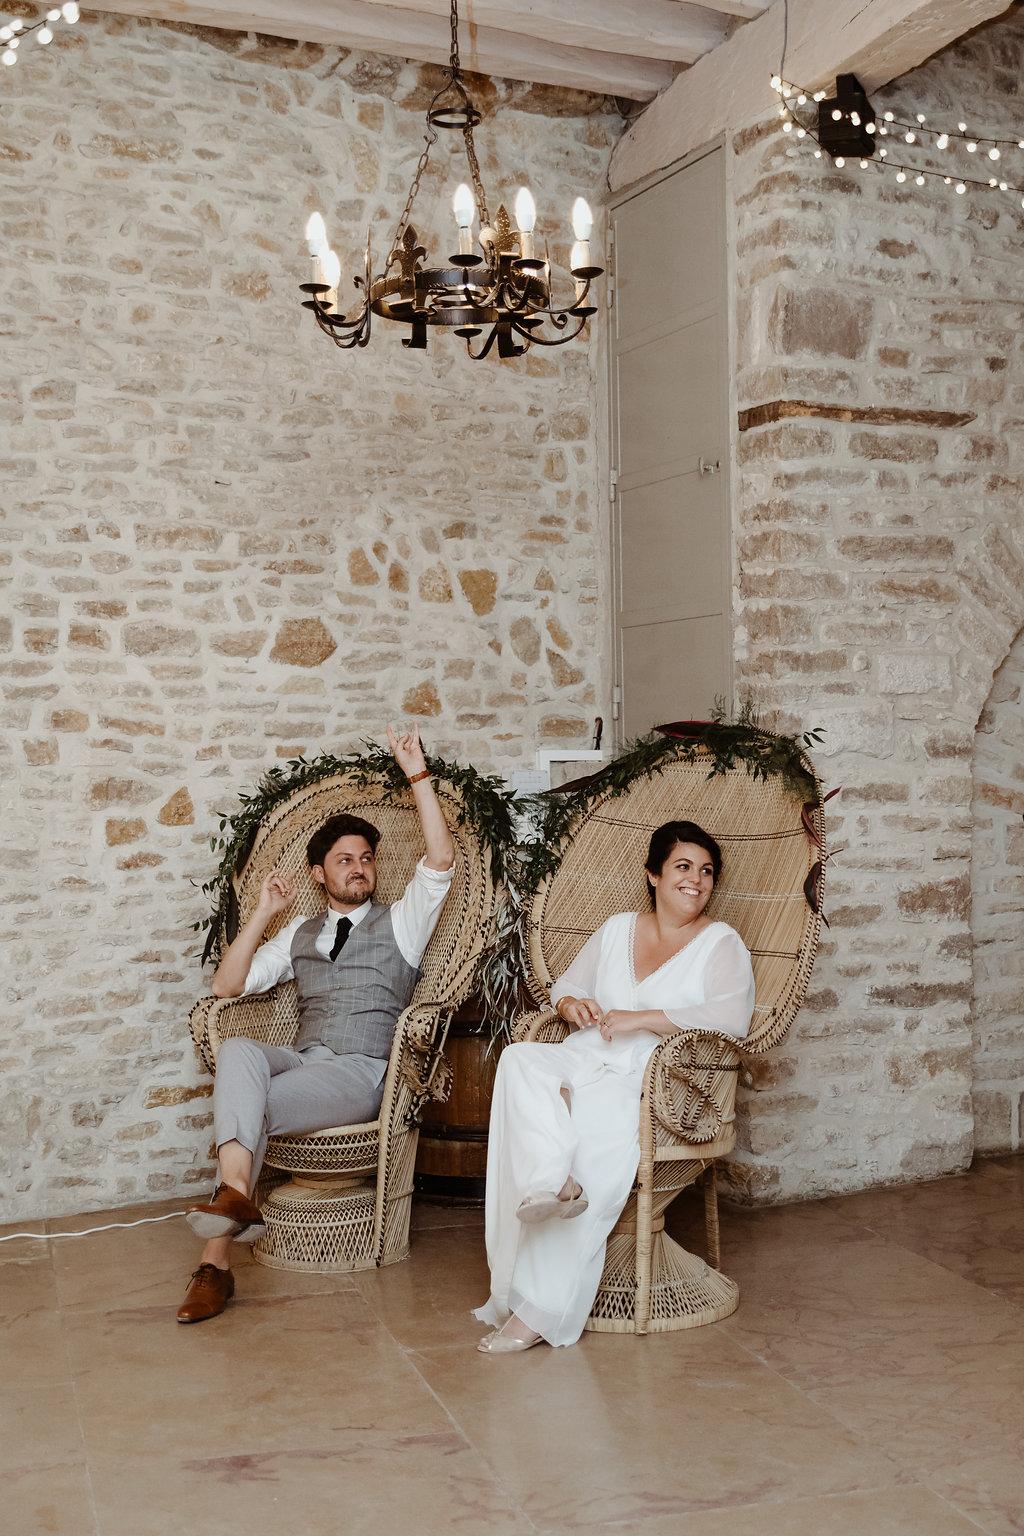 mariage d'automne Mariage d'automne M&B 169 - Blog Mariage